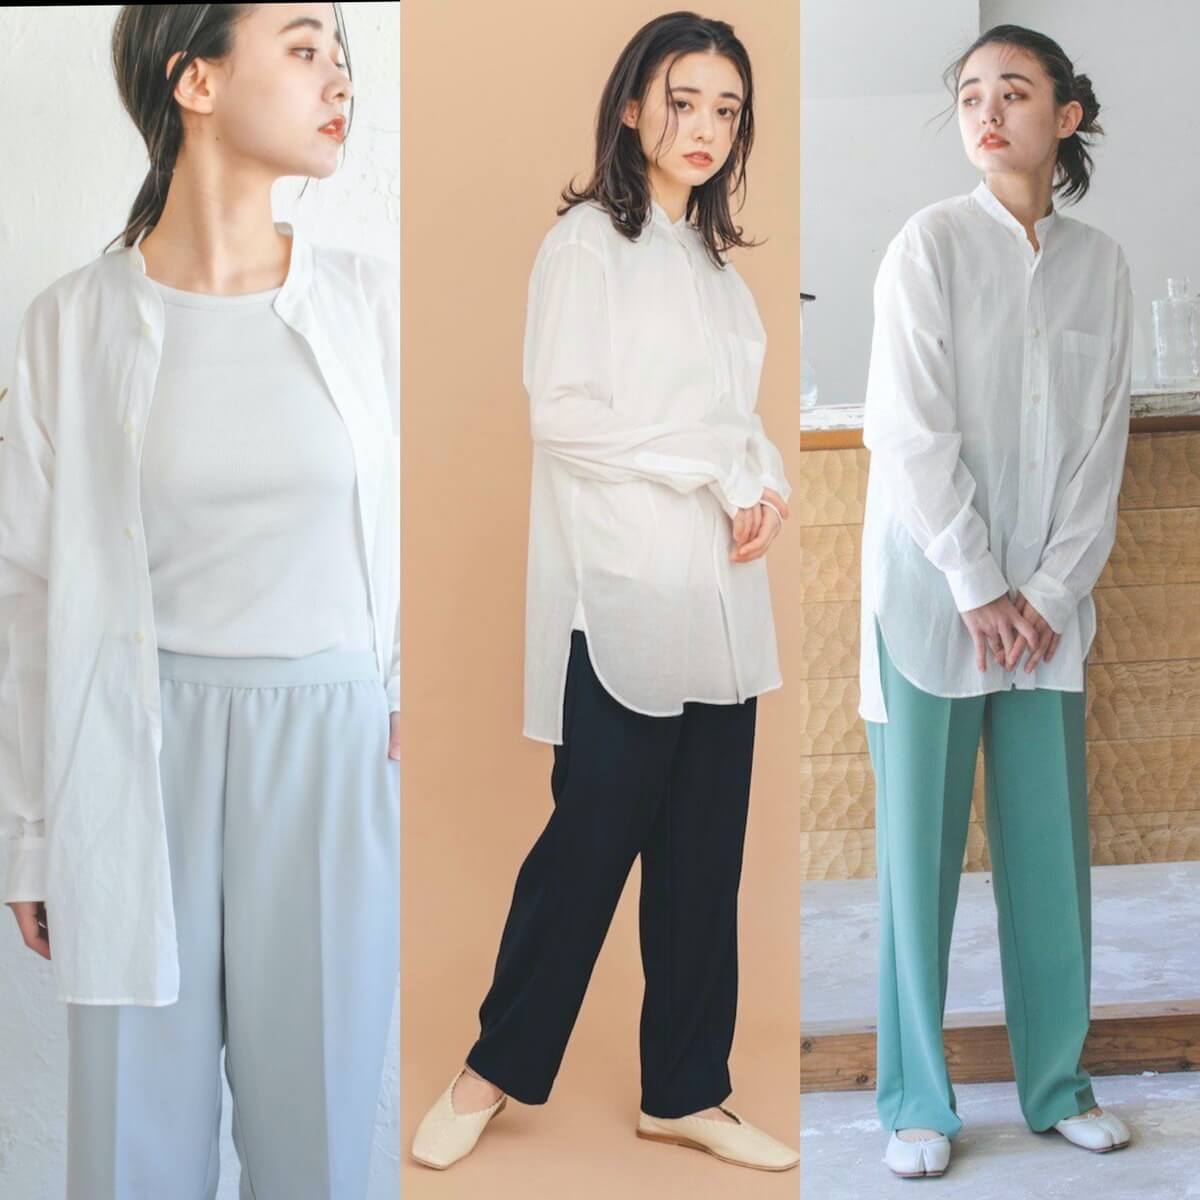 MERCI(メルシー)オーガニックコットンレイヤードシャツ